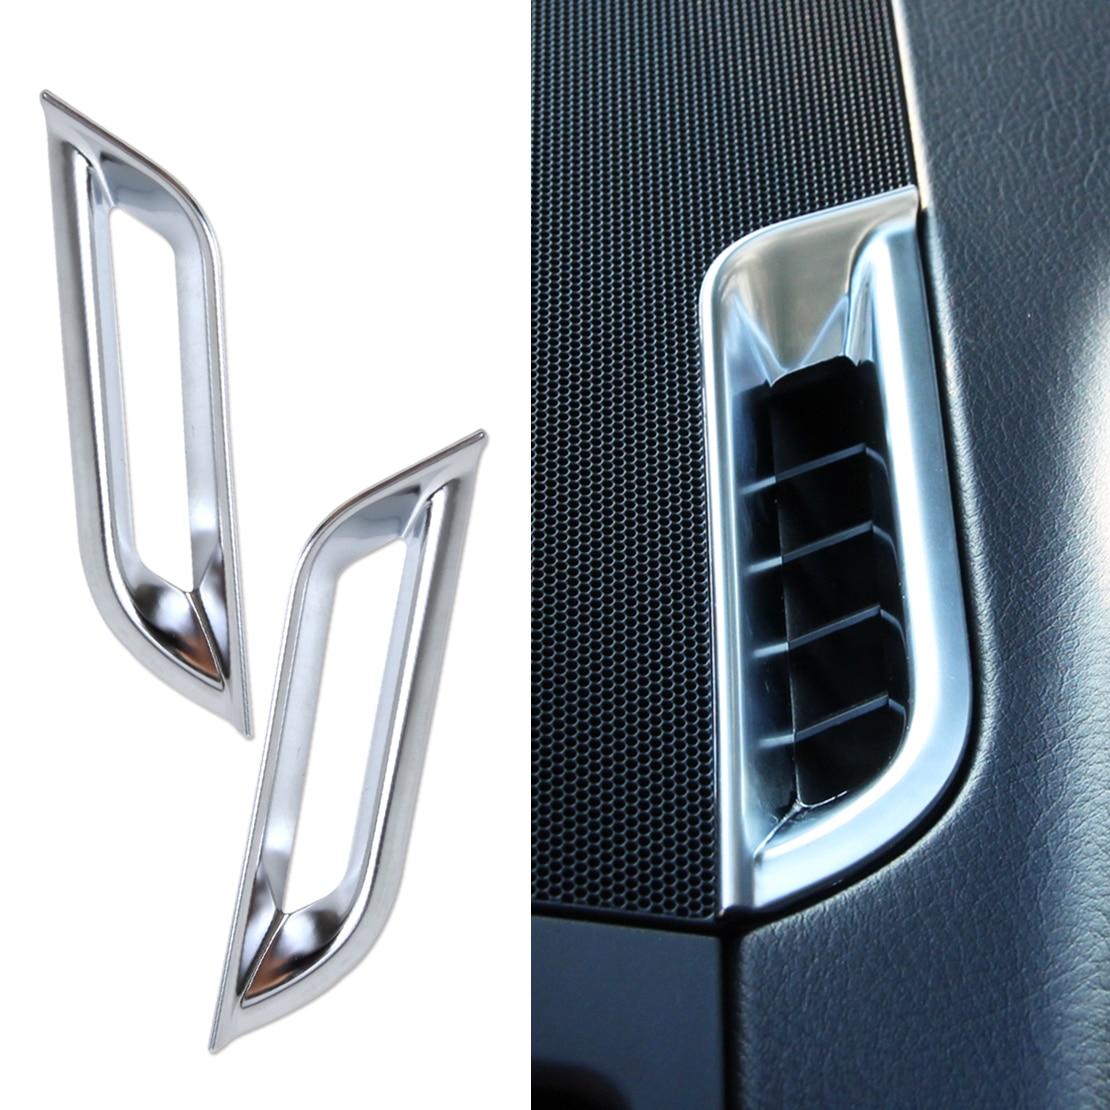 beler 2PCS New Chrome Dashboard AC Air Vent Trim Cover For Land Rover FREELANDER 2 LR2 2008 2009 2010 2011 2012 2103 2014 2015